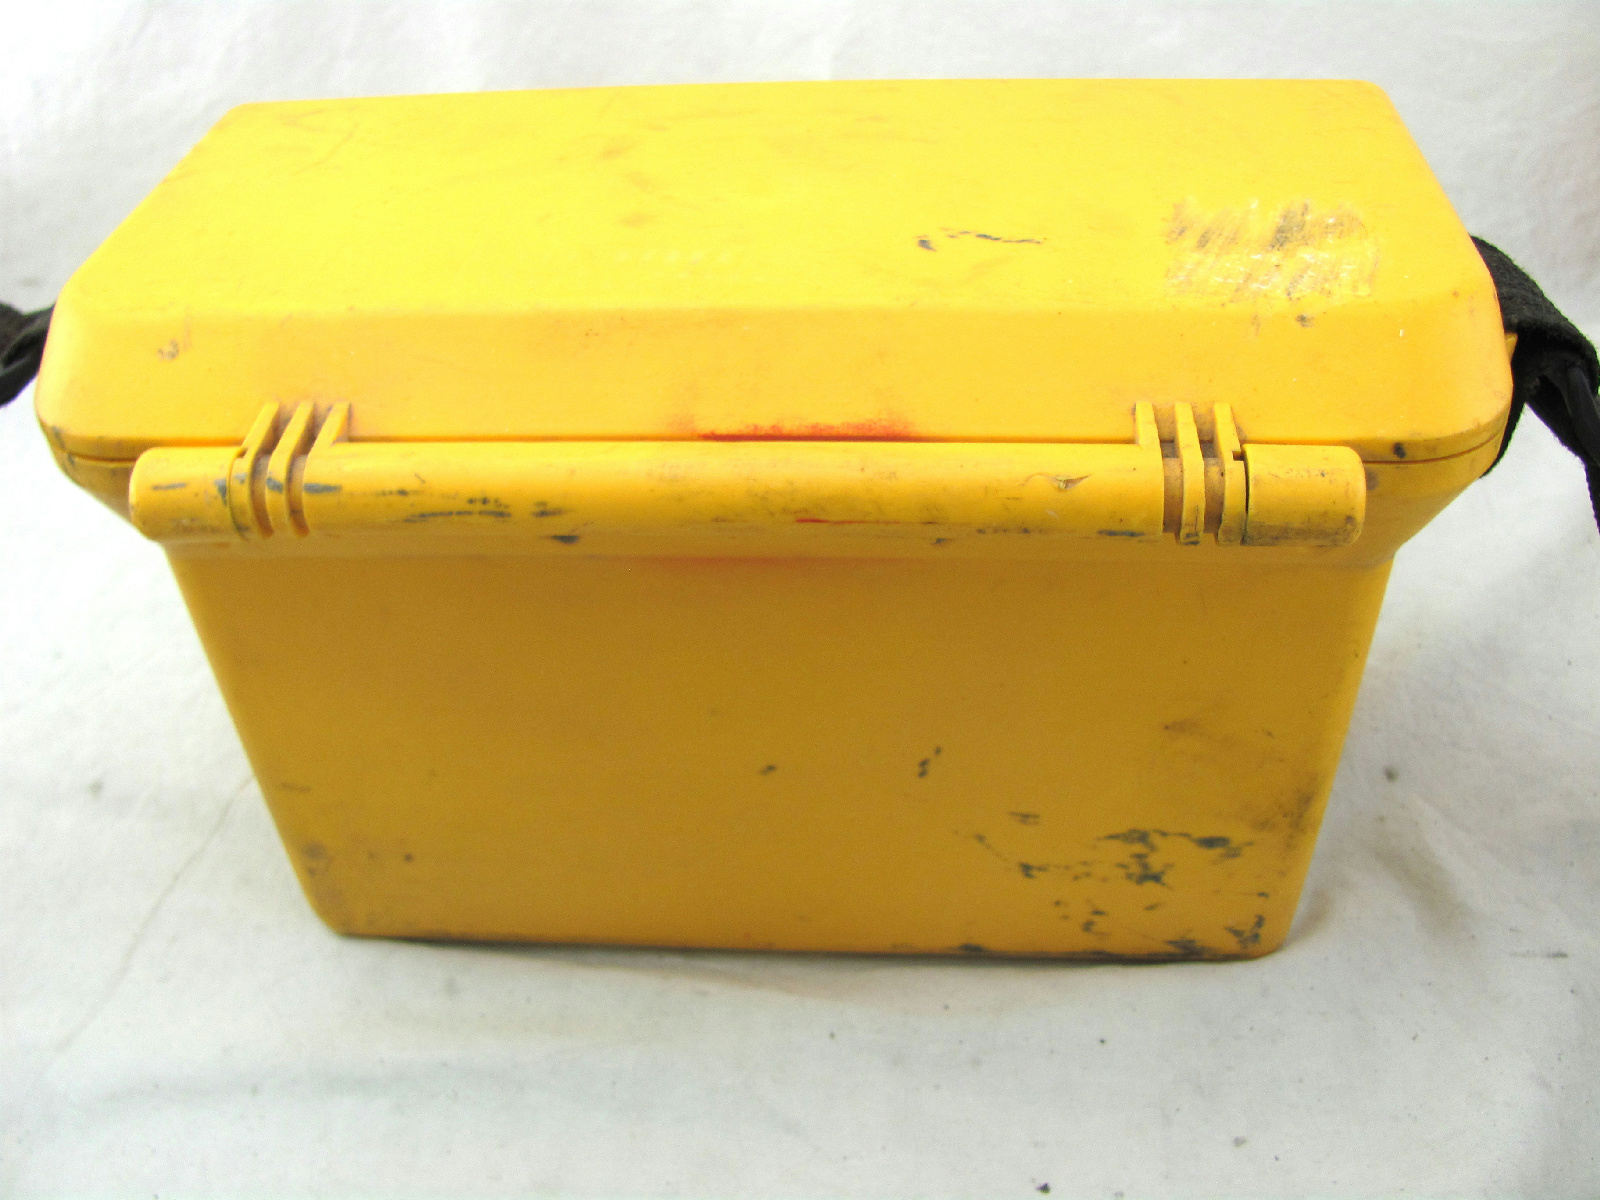 dynatel 2273 cable locator manual